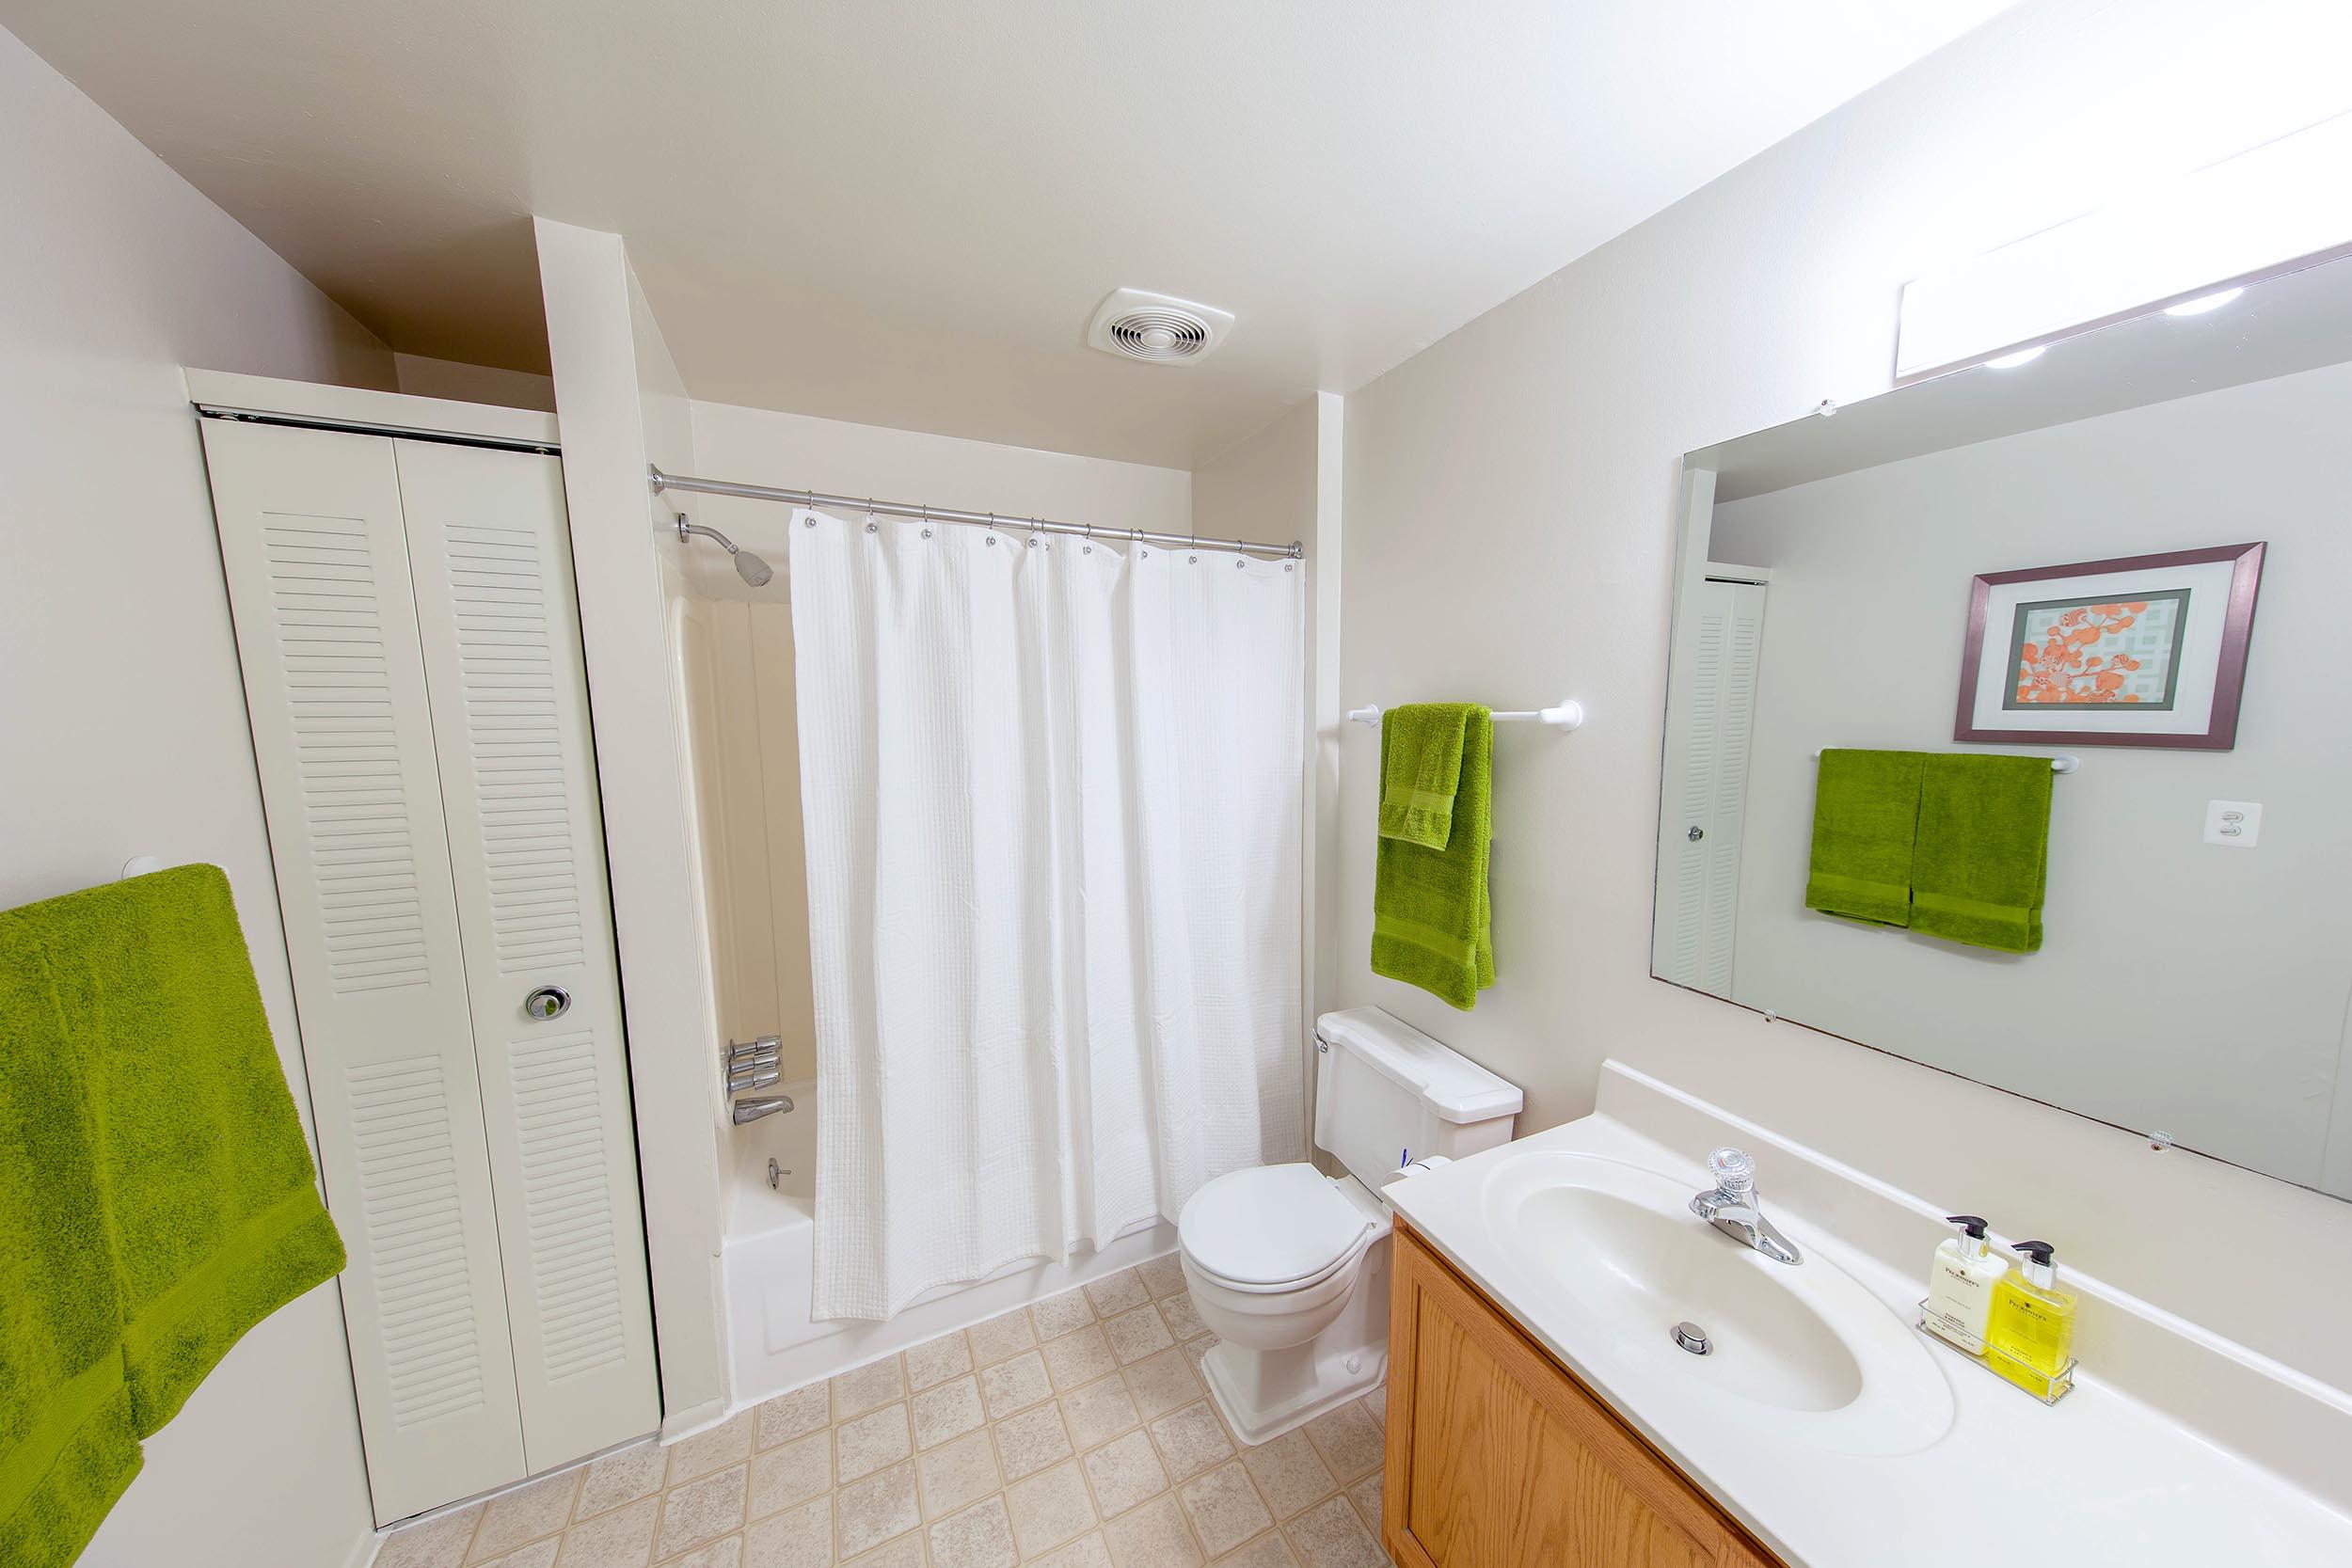 Mcc-20700-20bathroom-2